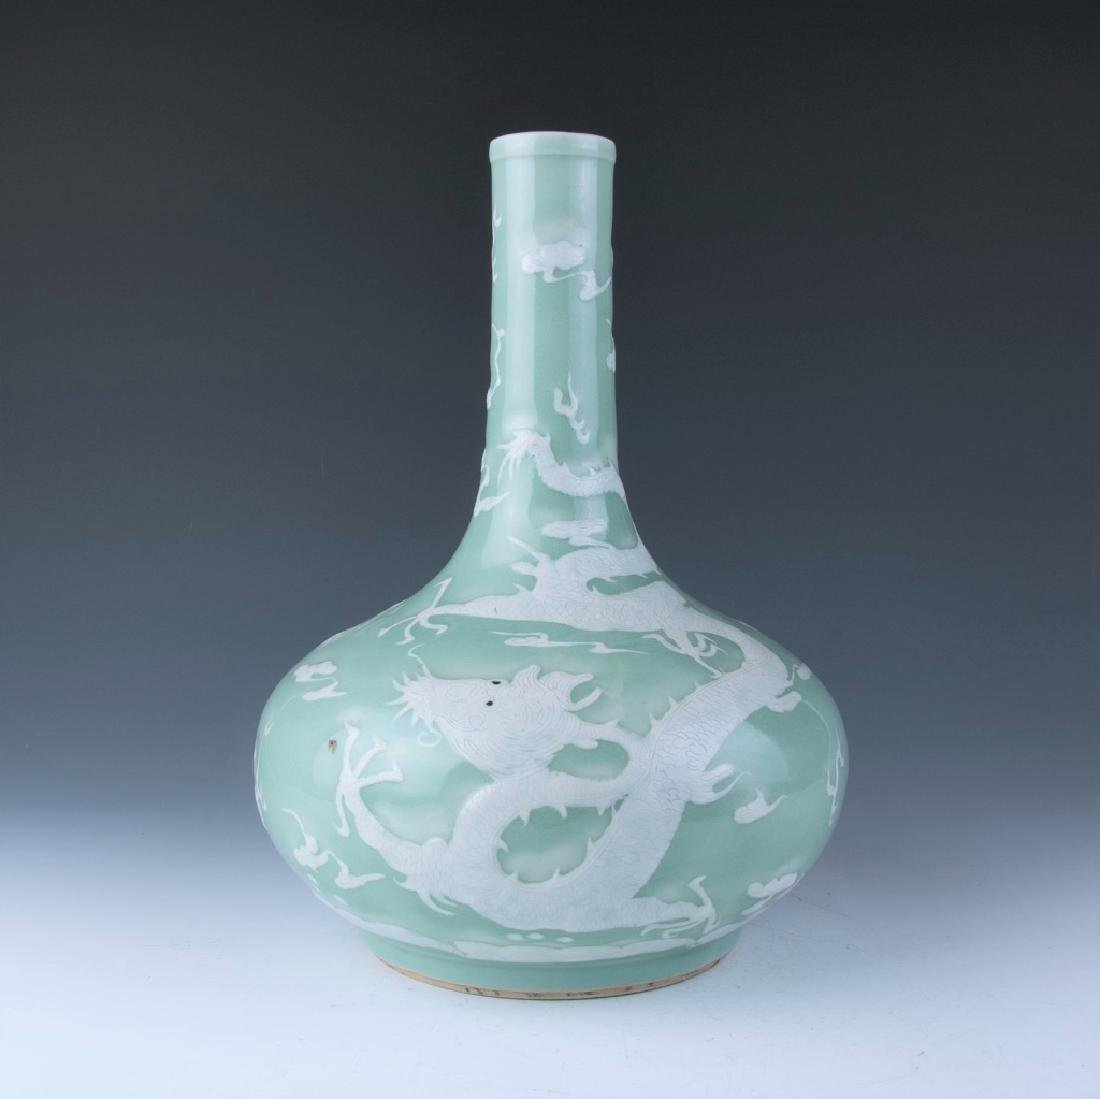 A Slip-Decorated Celadon Glazed Vase, 19th Century